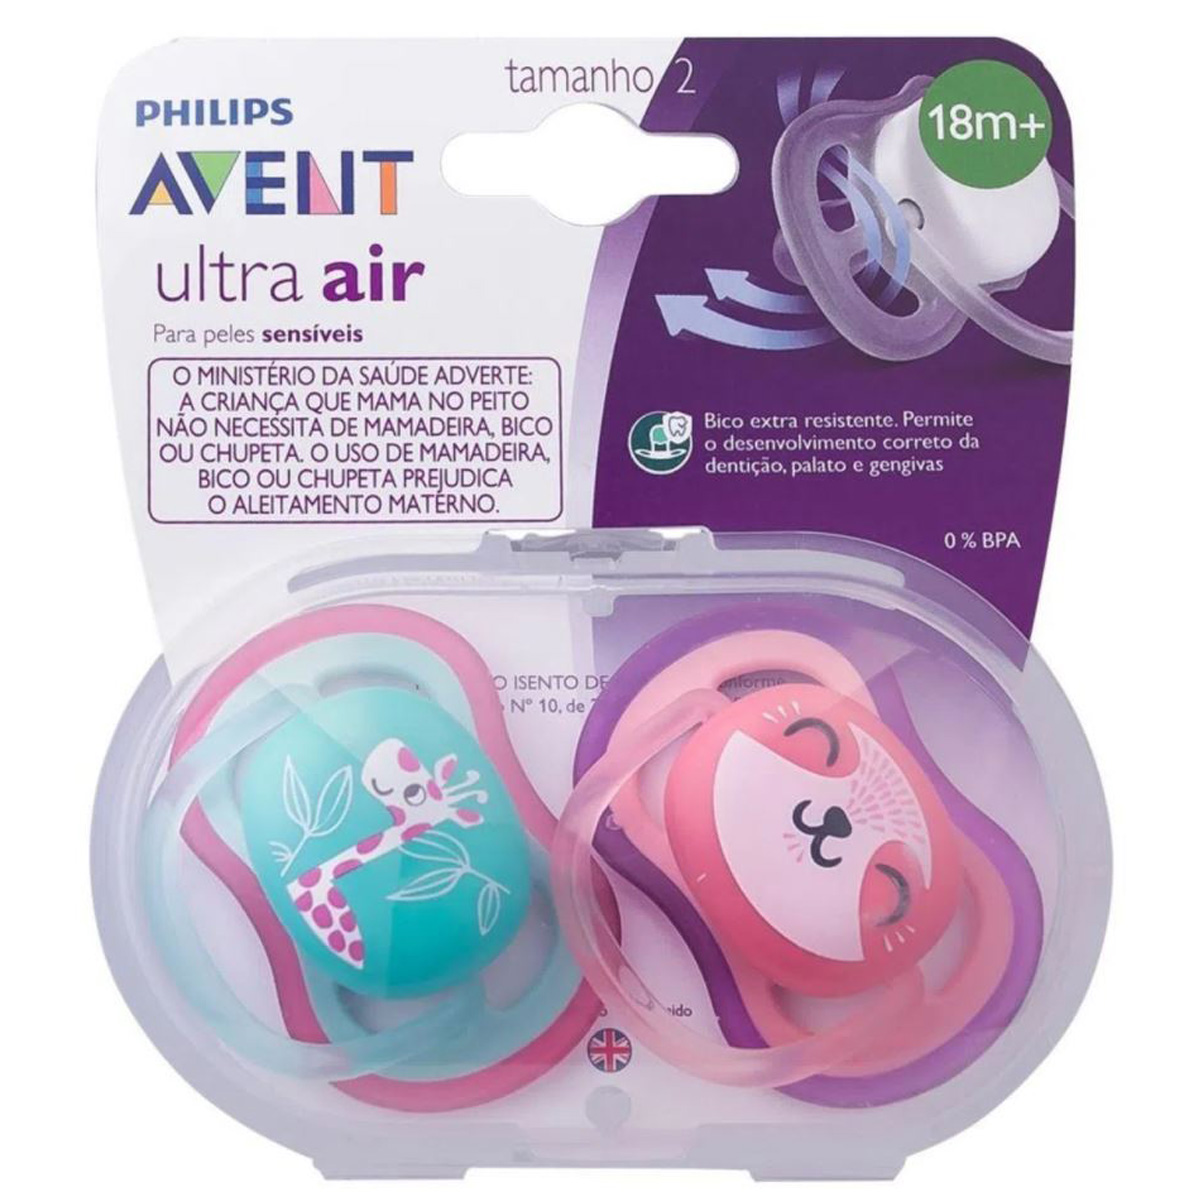 Chupeta Avent Menina Ultra Air Dupla Rosa Tamanho 2 18+ Mes